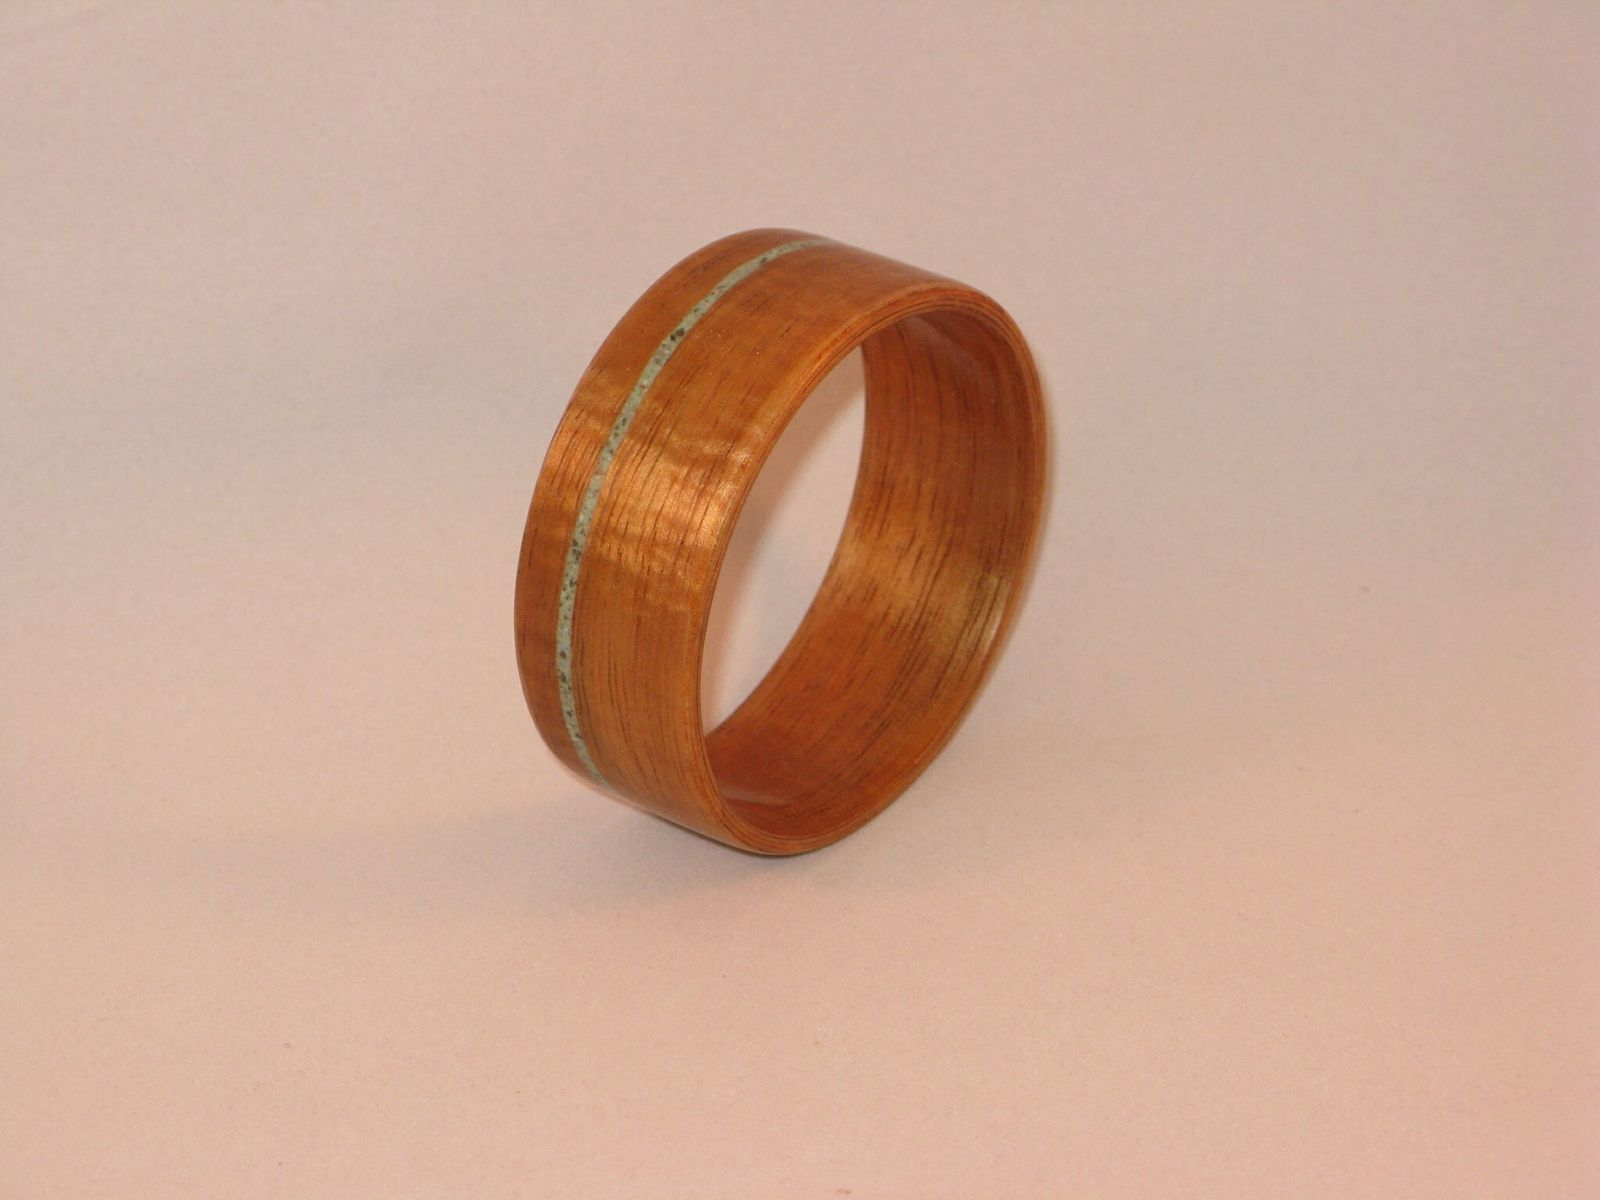 2992f96f0e2de Hand Crafted Figured Hawaiian Koa Bentwood Bangle Bracelet With Turquoise  Inlay-Handmade Wooden Bracelet by Cronin Woodworking